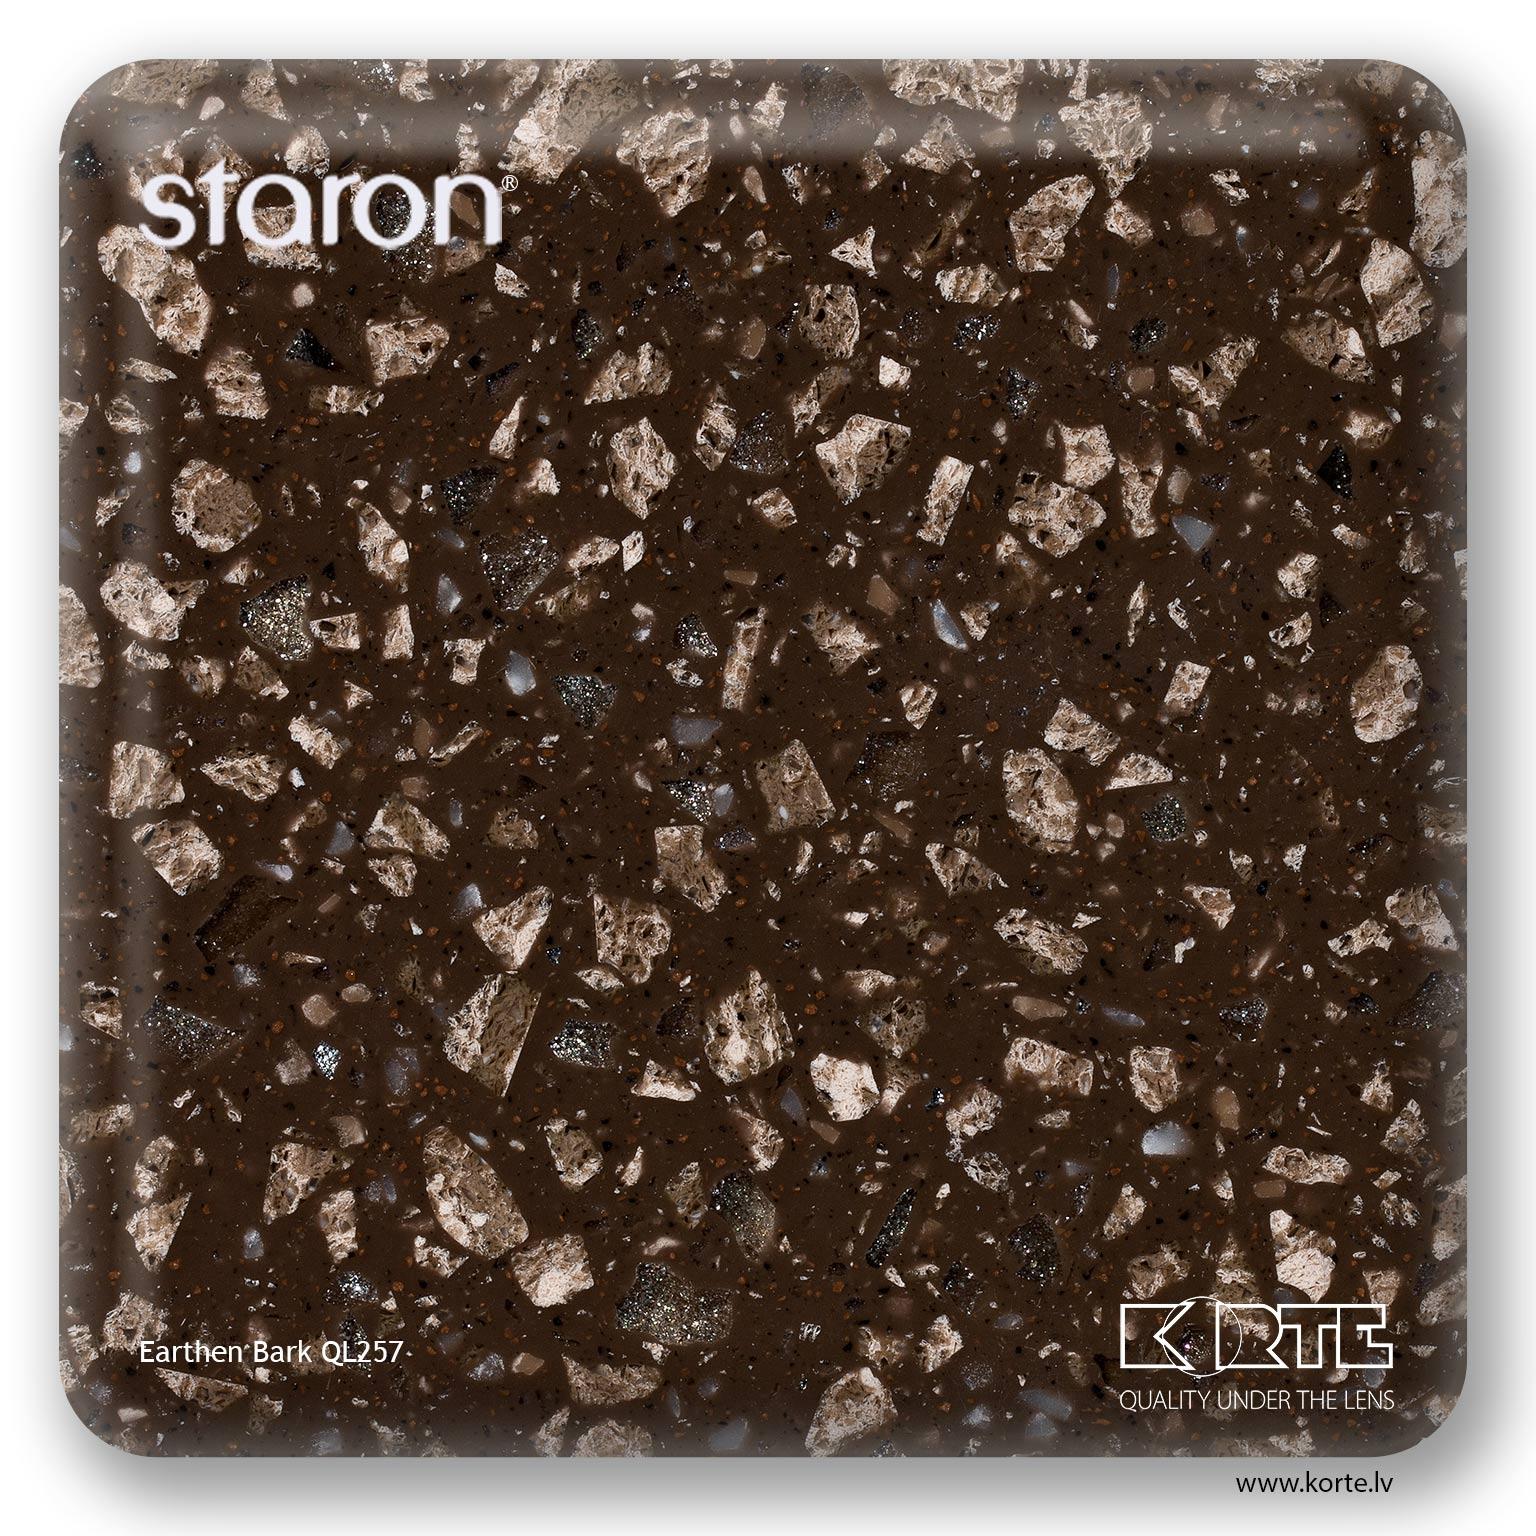 Staron Earthen Bark QL257